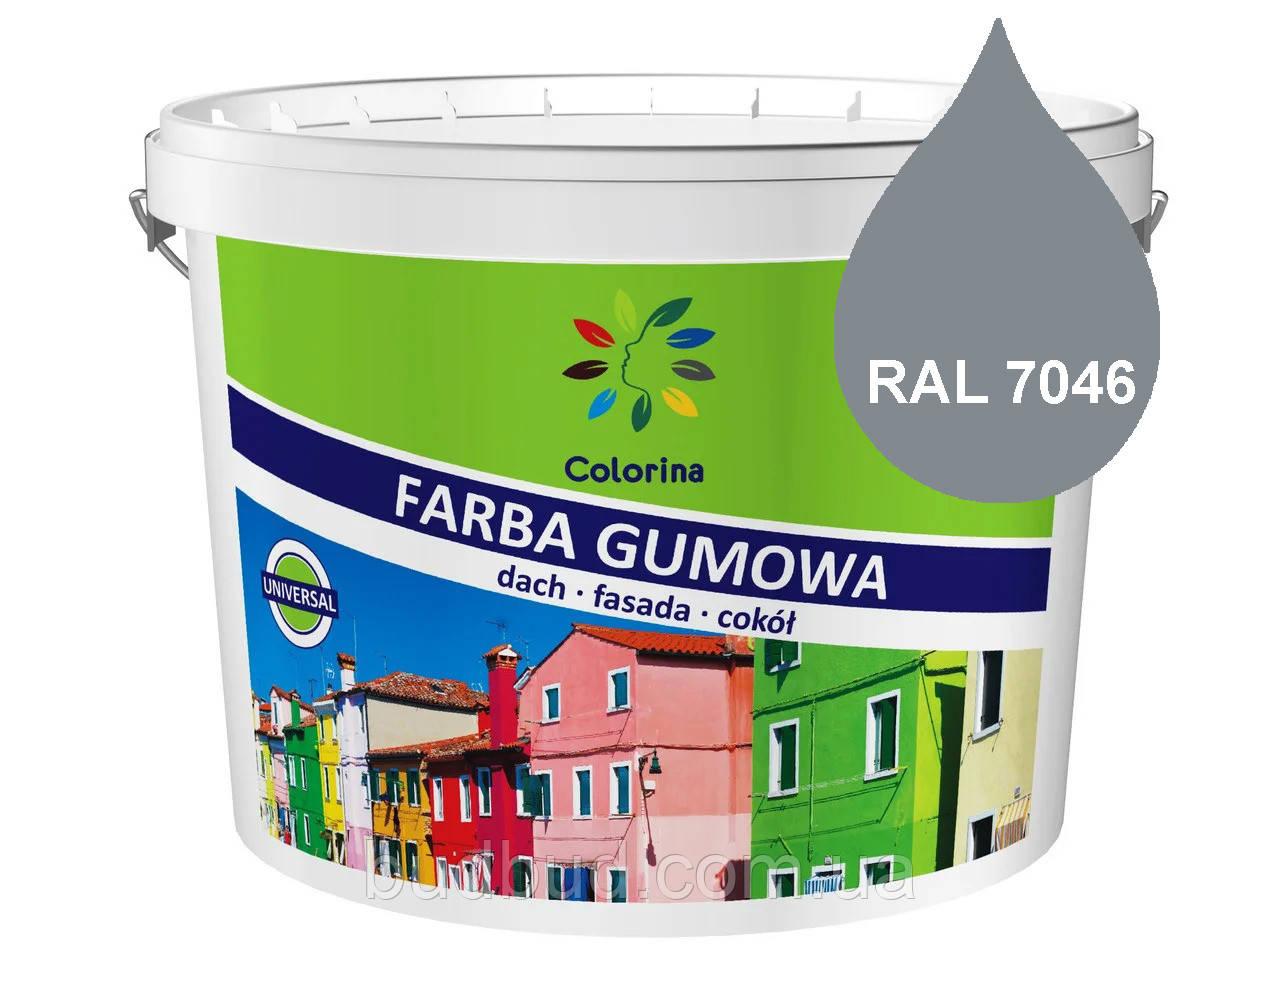 Фарба гумова сіра RAL 7046 COLORINA  6 кг